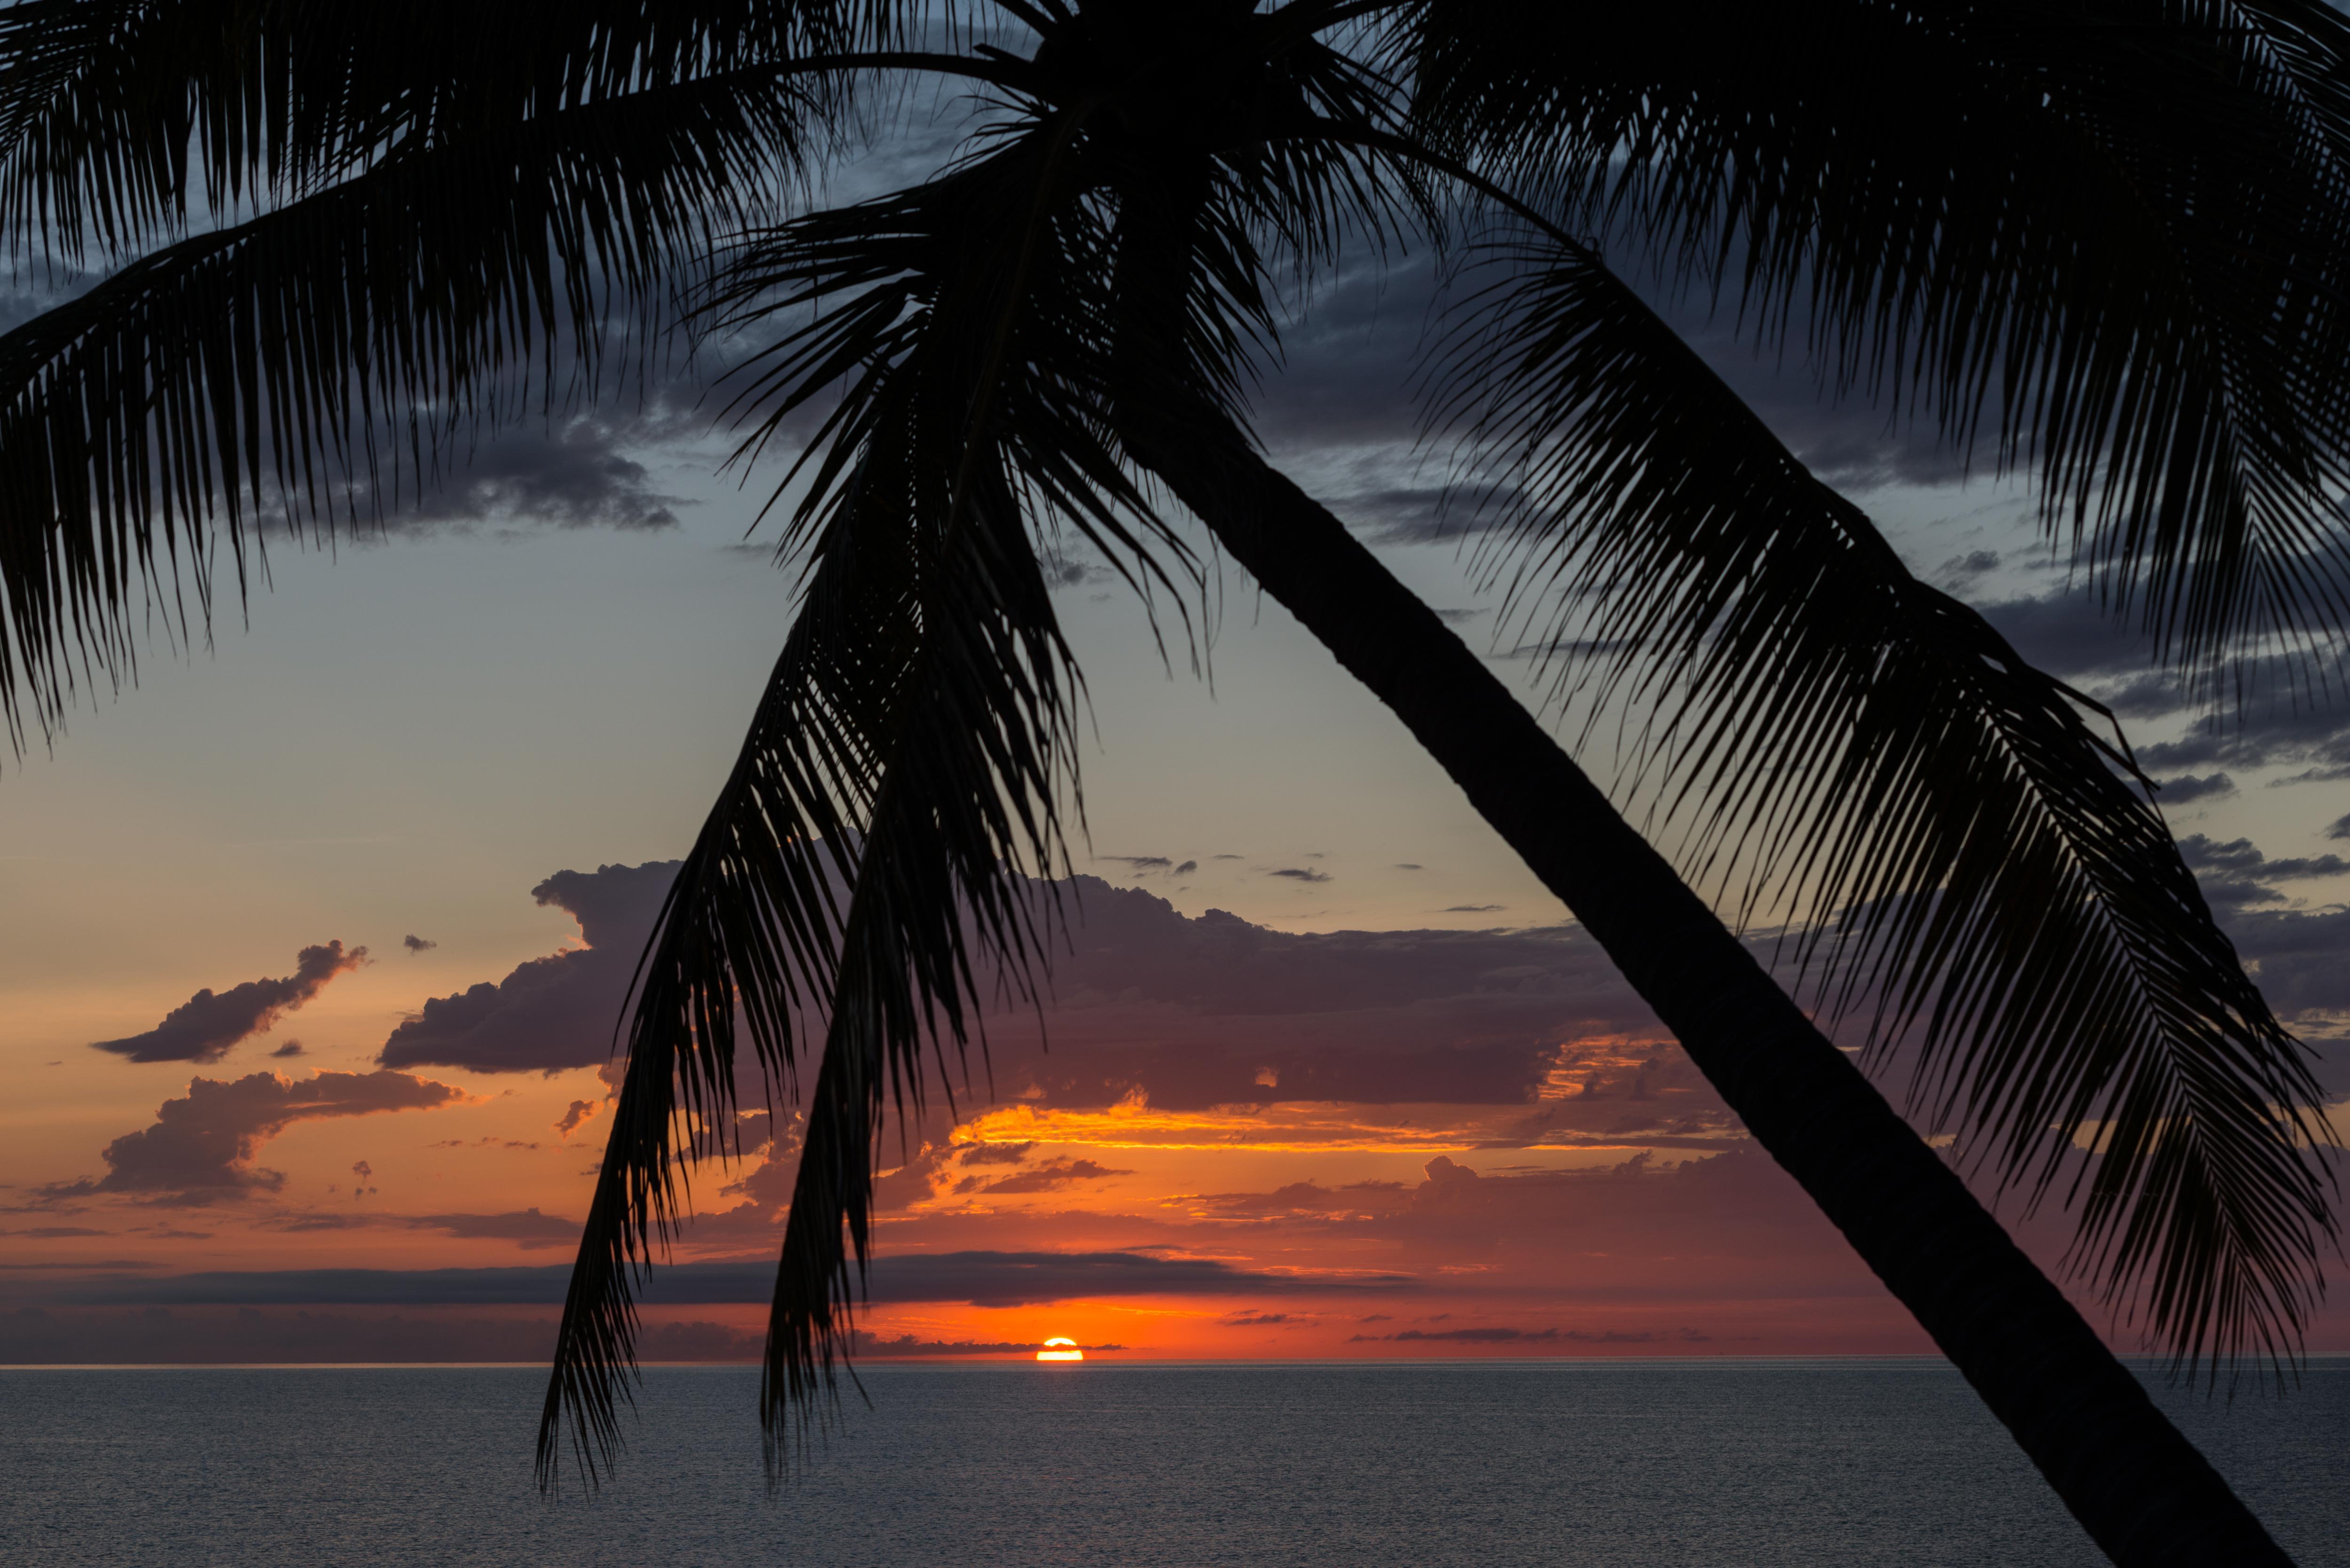 https://www.thalabeach.com.au/wp-content/uploads/2010/07/Thala_Beach_Nature_Reserve_2016__51.jpg